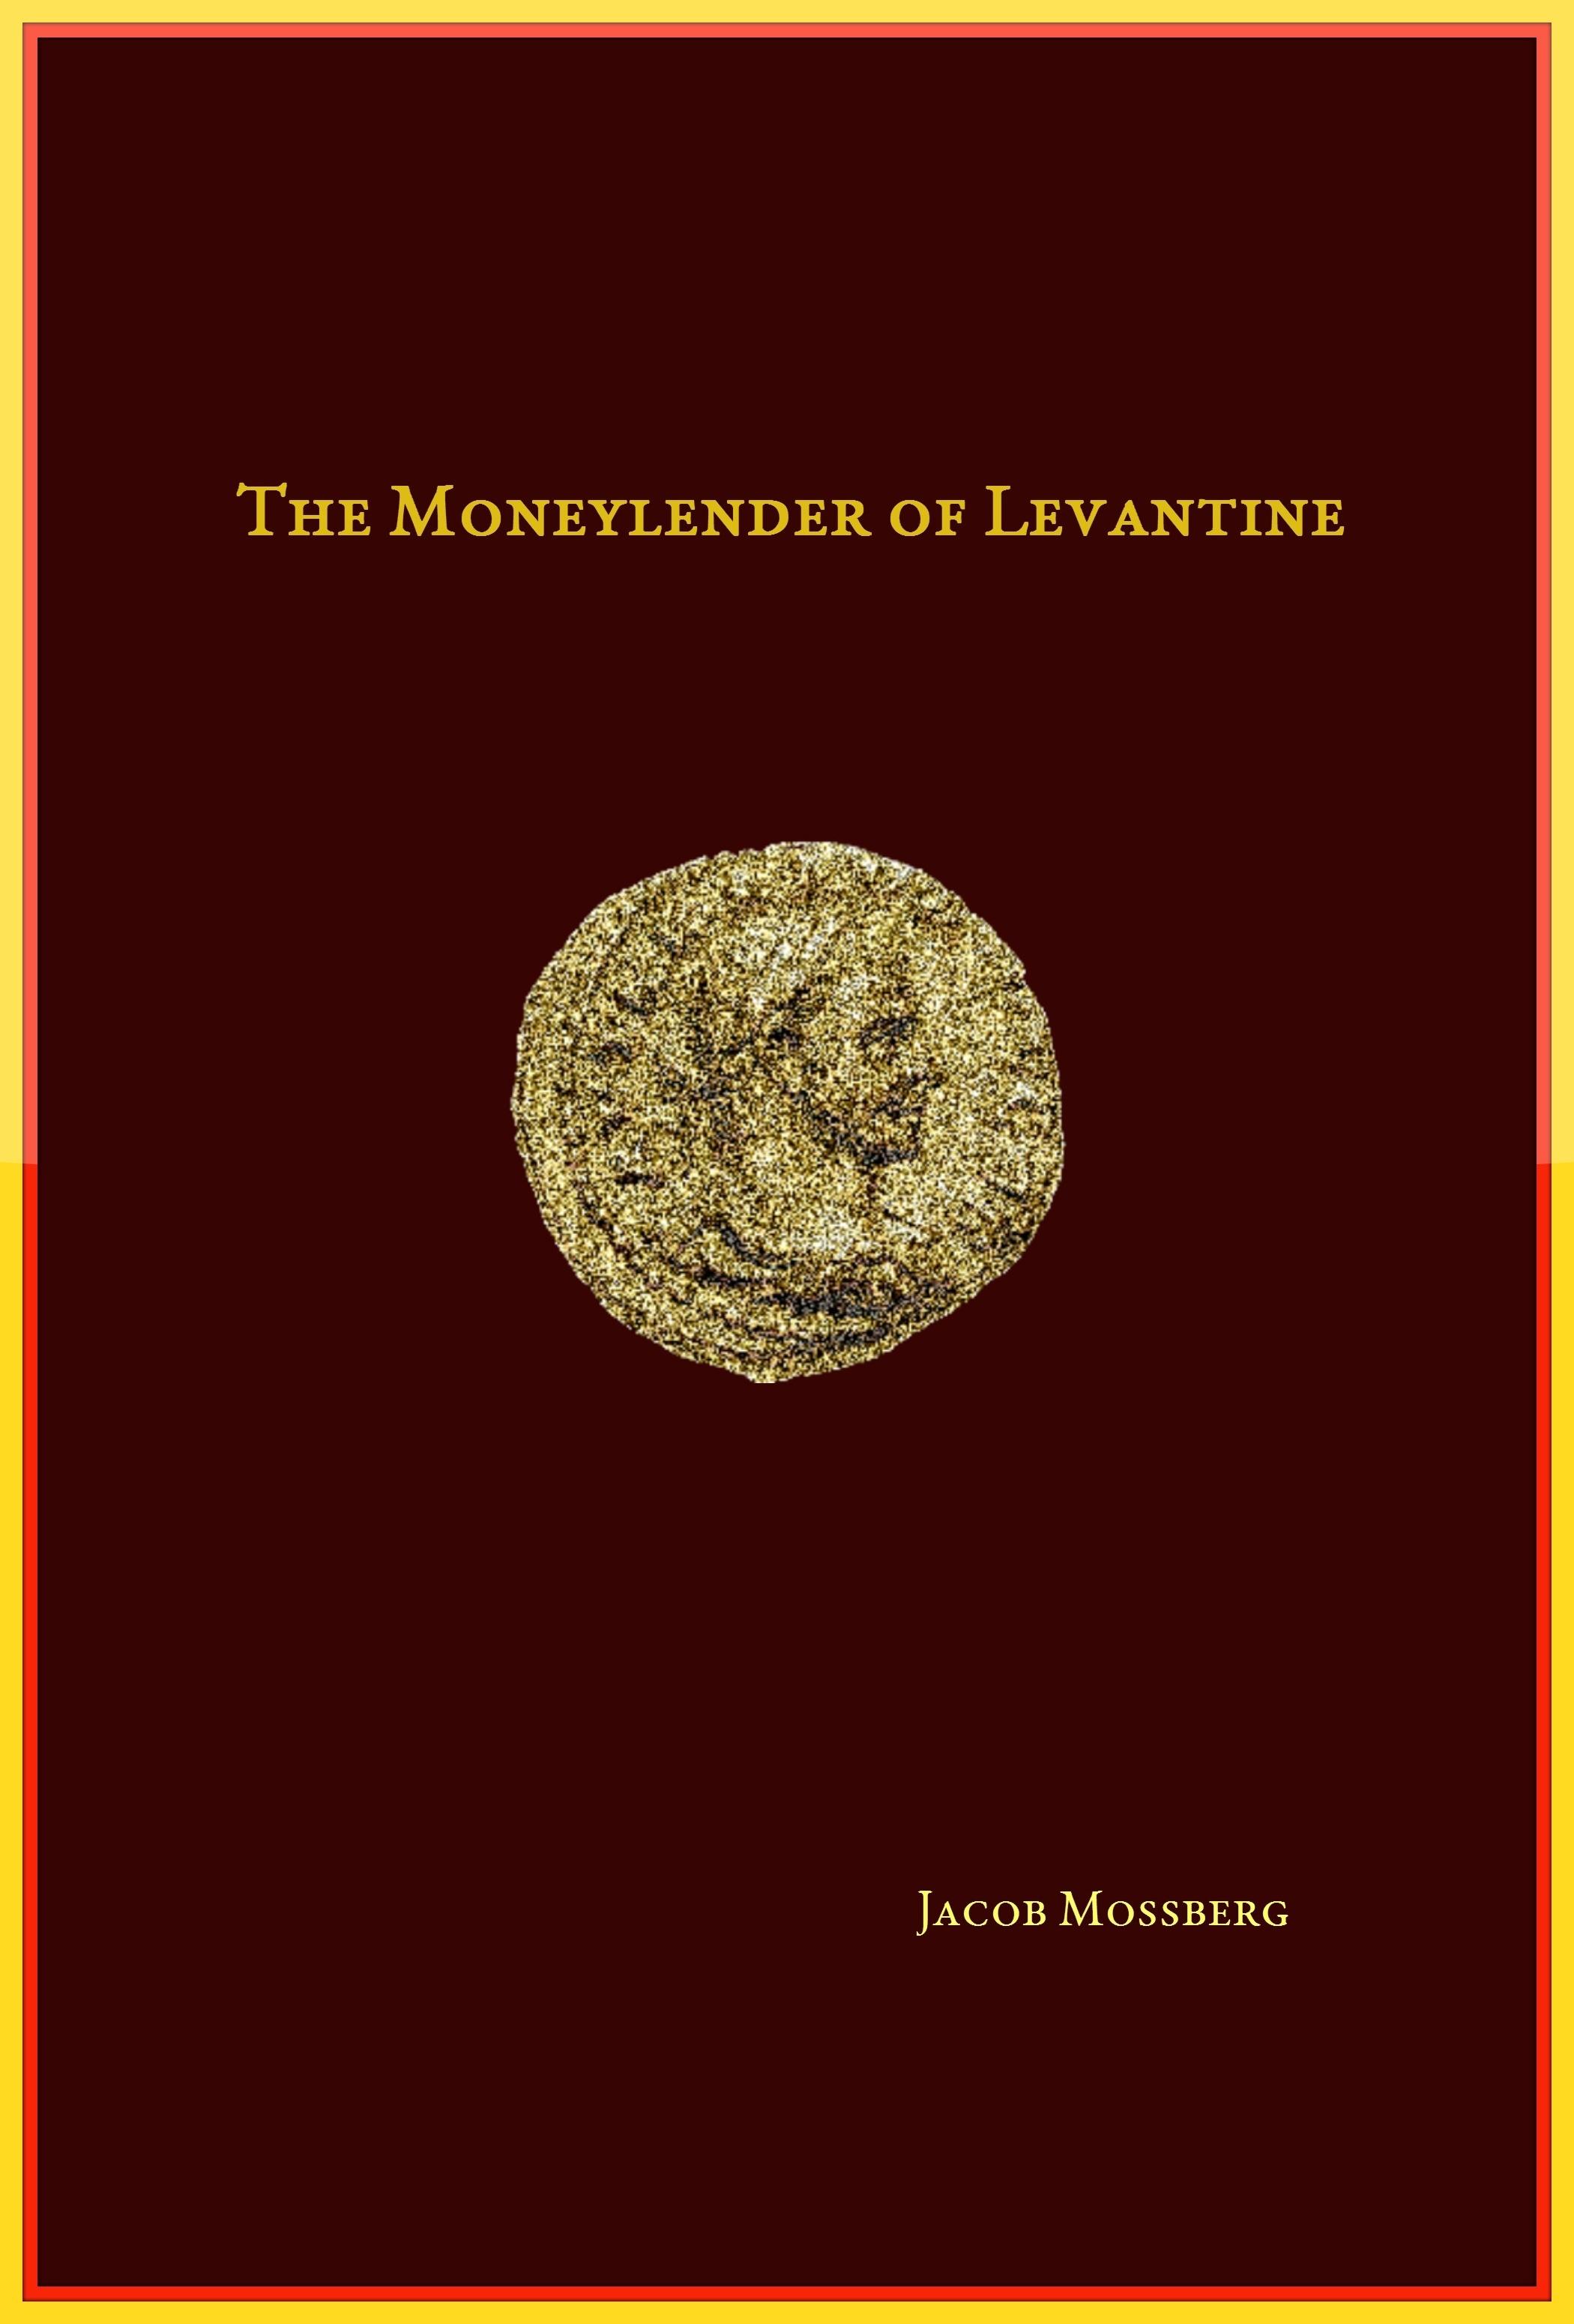 The Moneylender Of Levantine  by  Jacob Mossberg